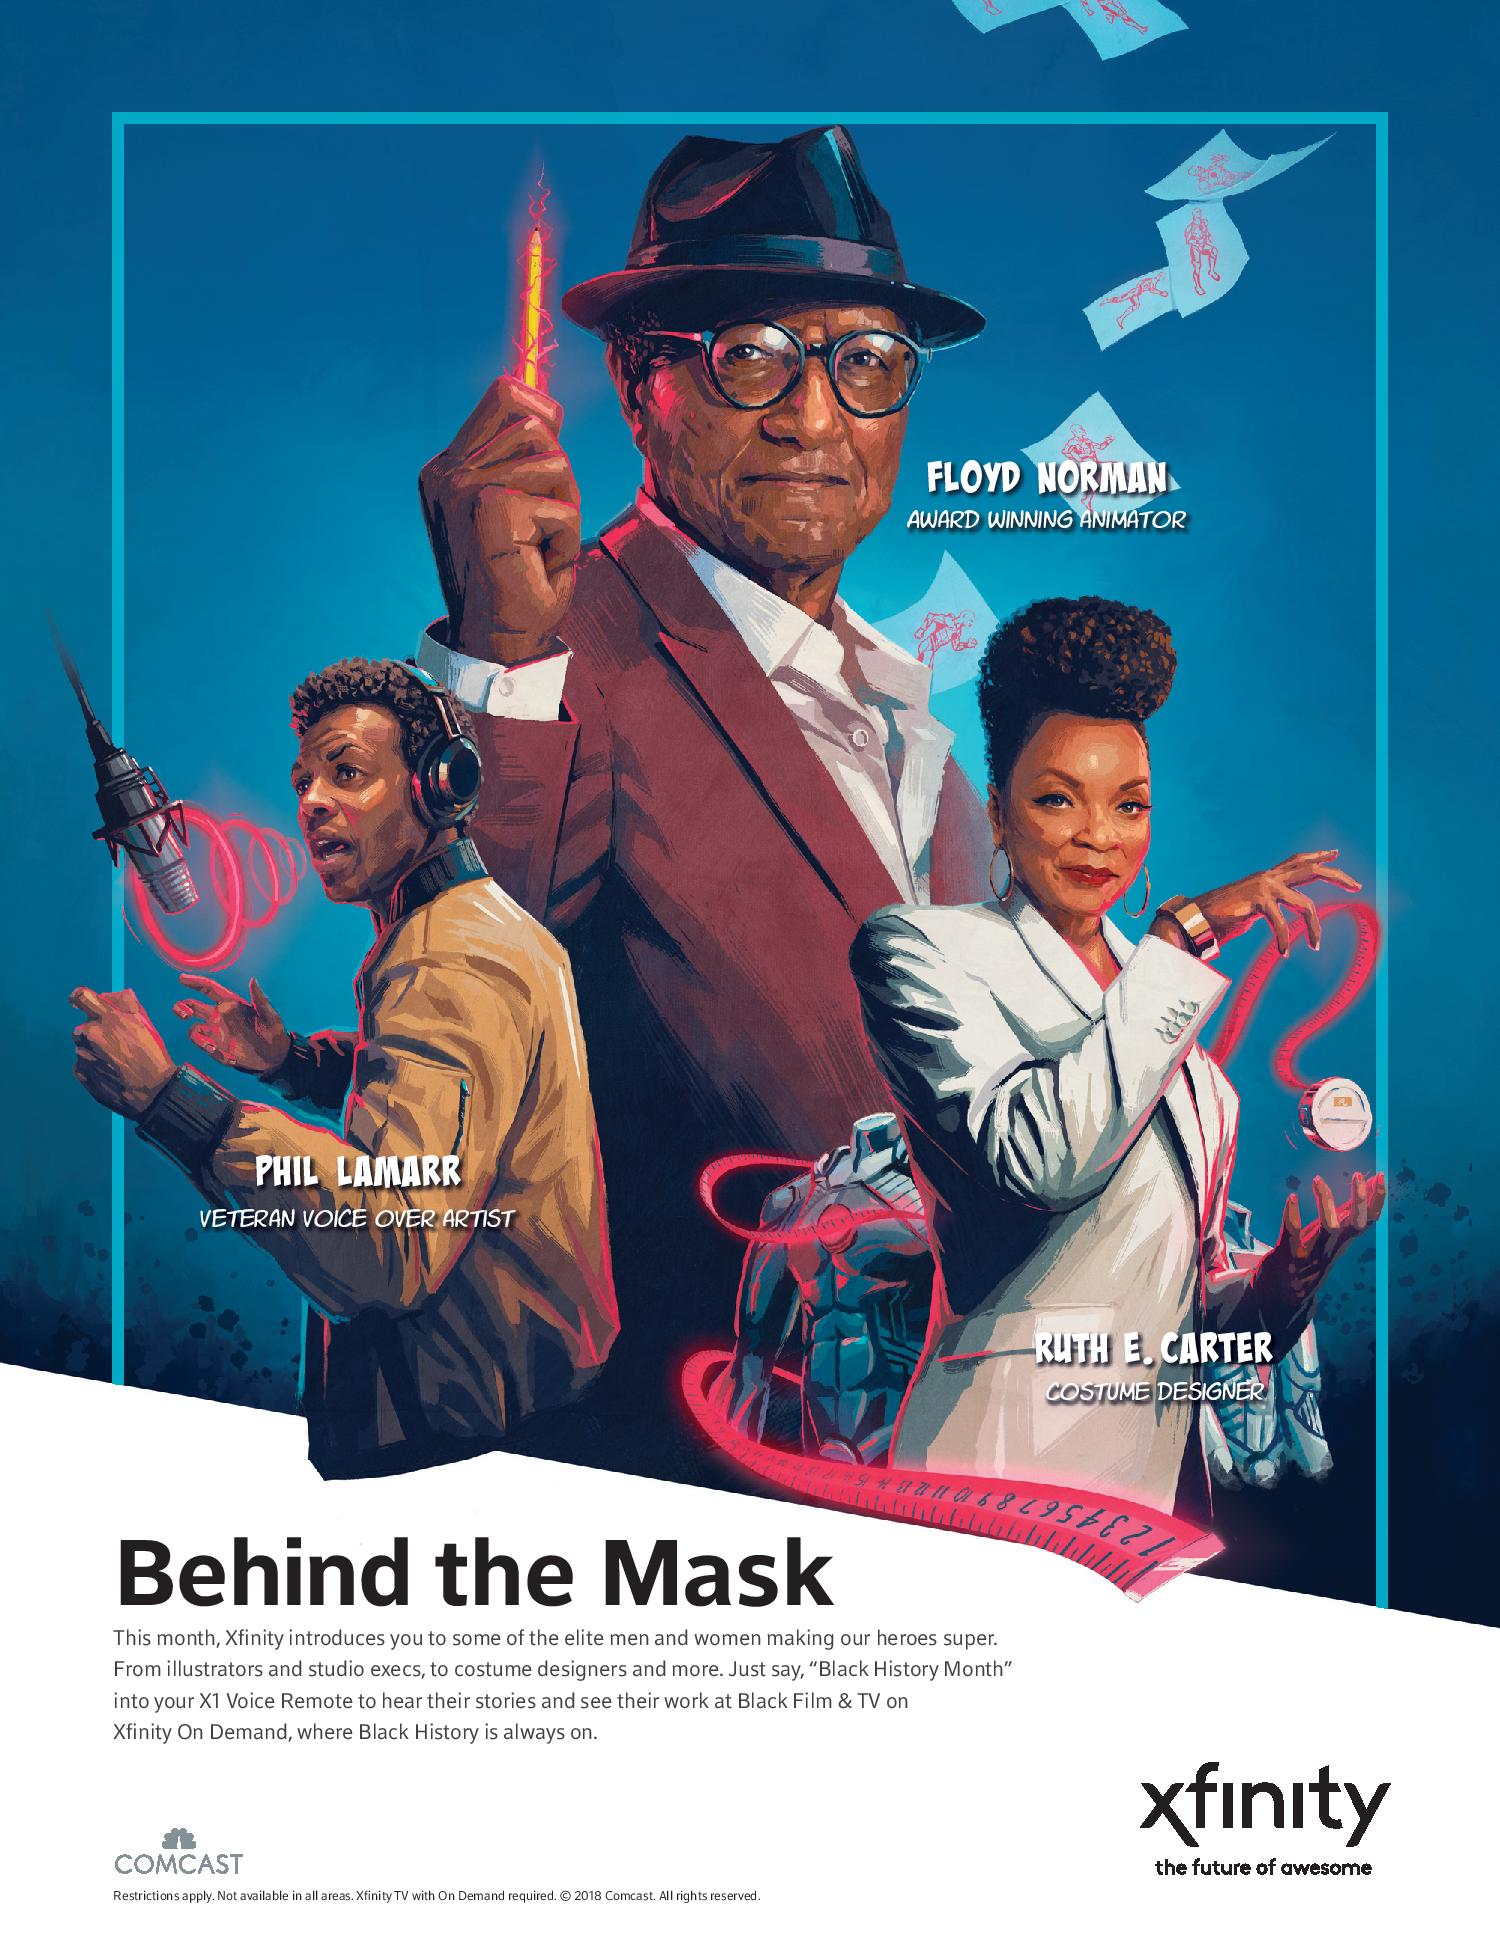 Comcast Launching Groundbreakers: Superheroes Behind the Mask